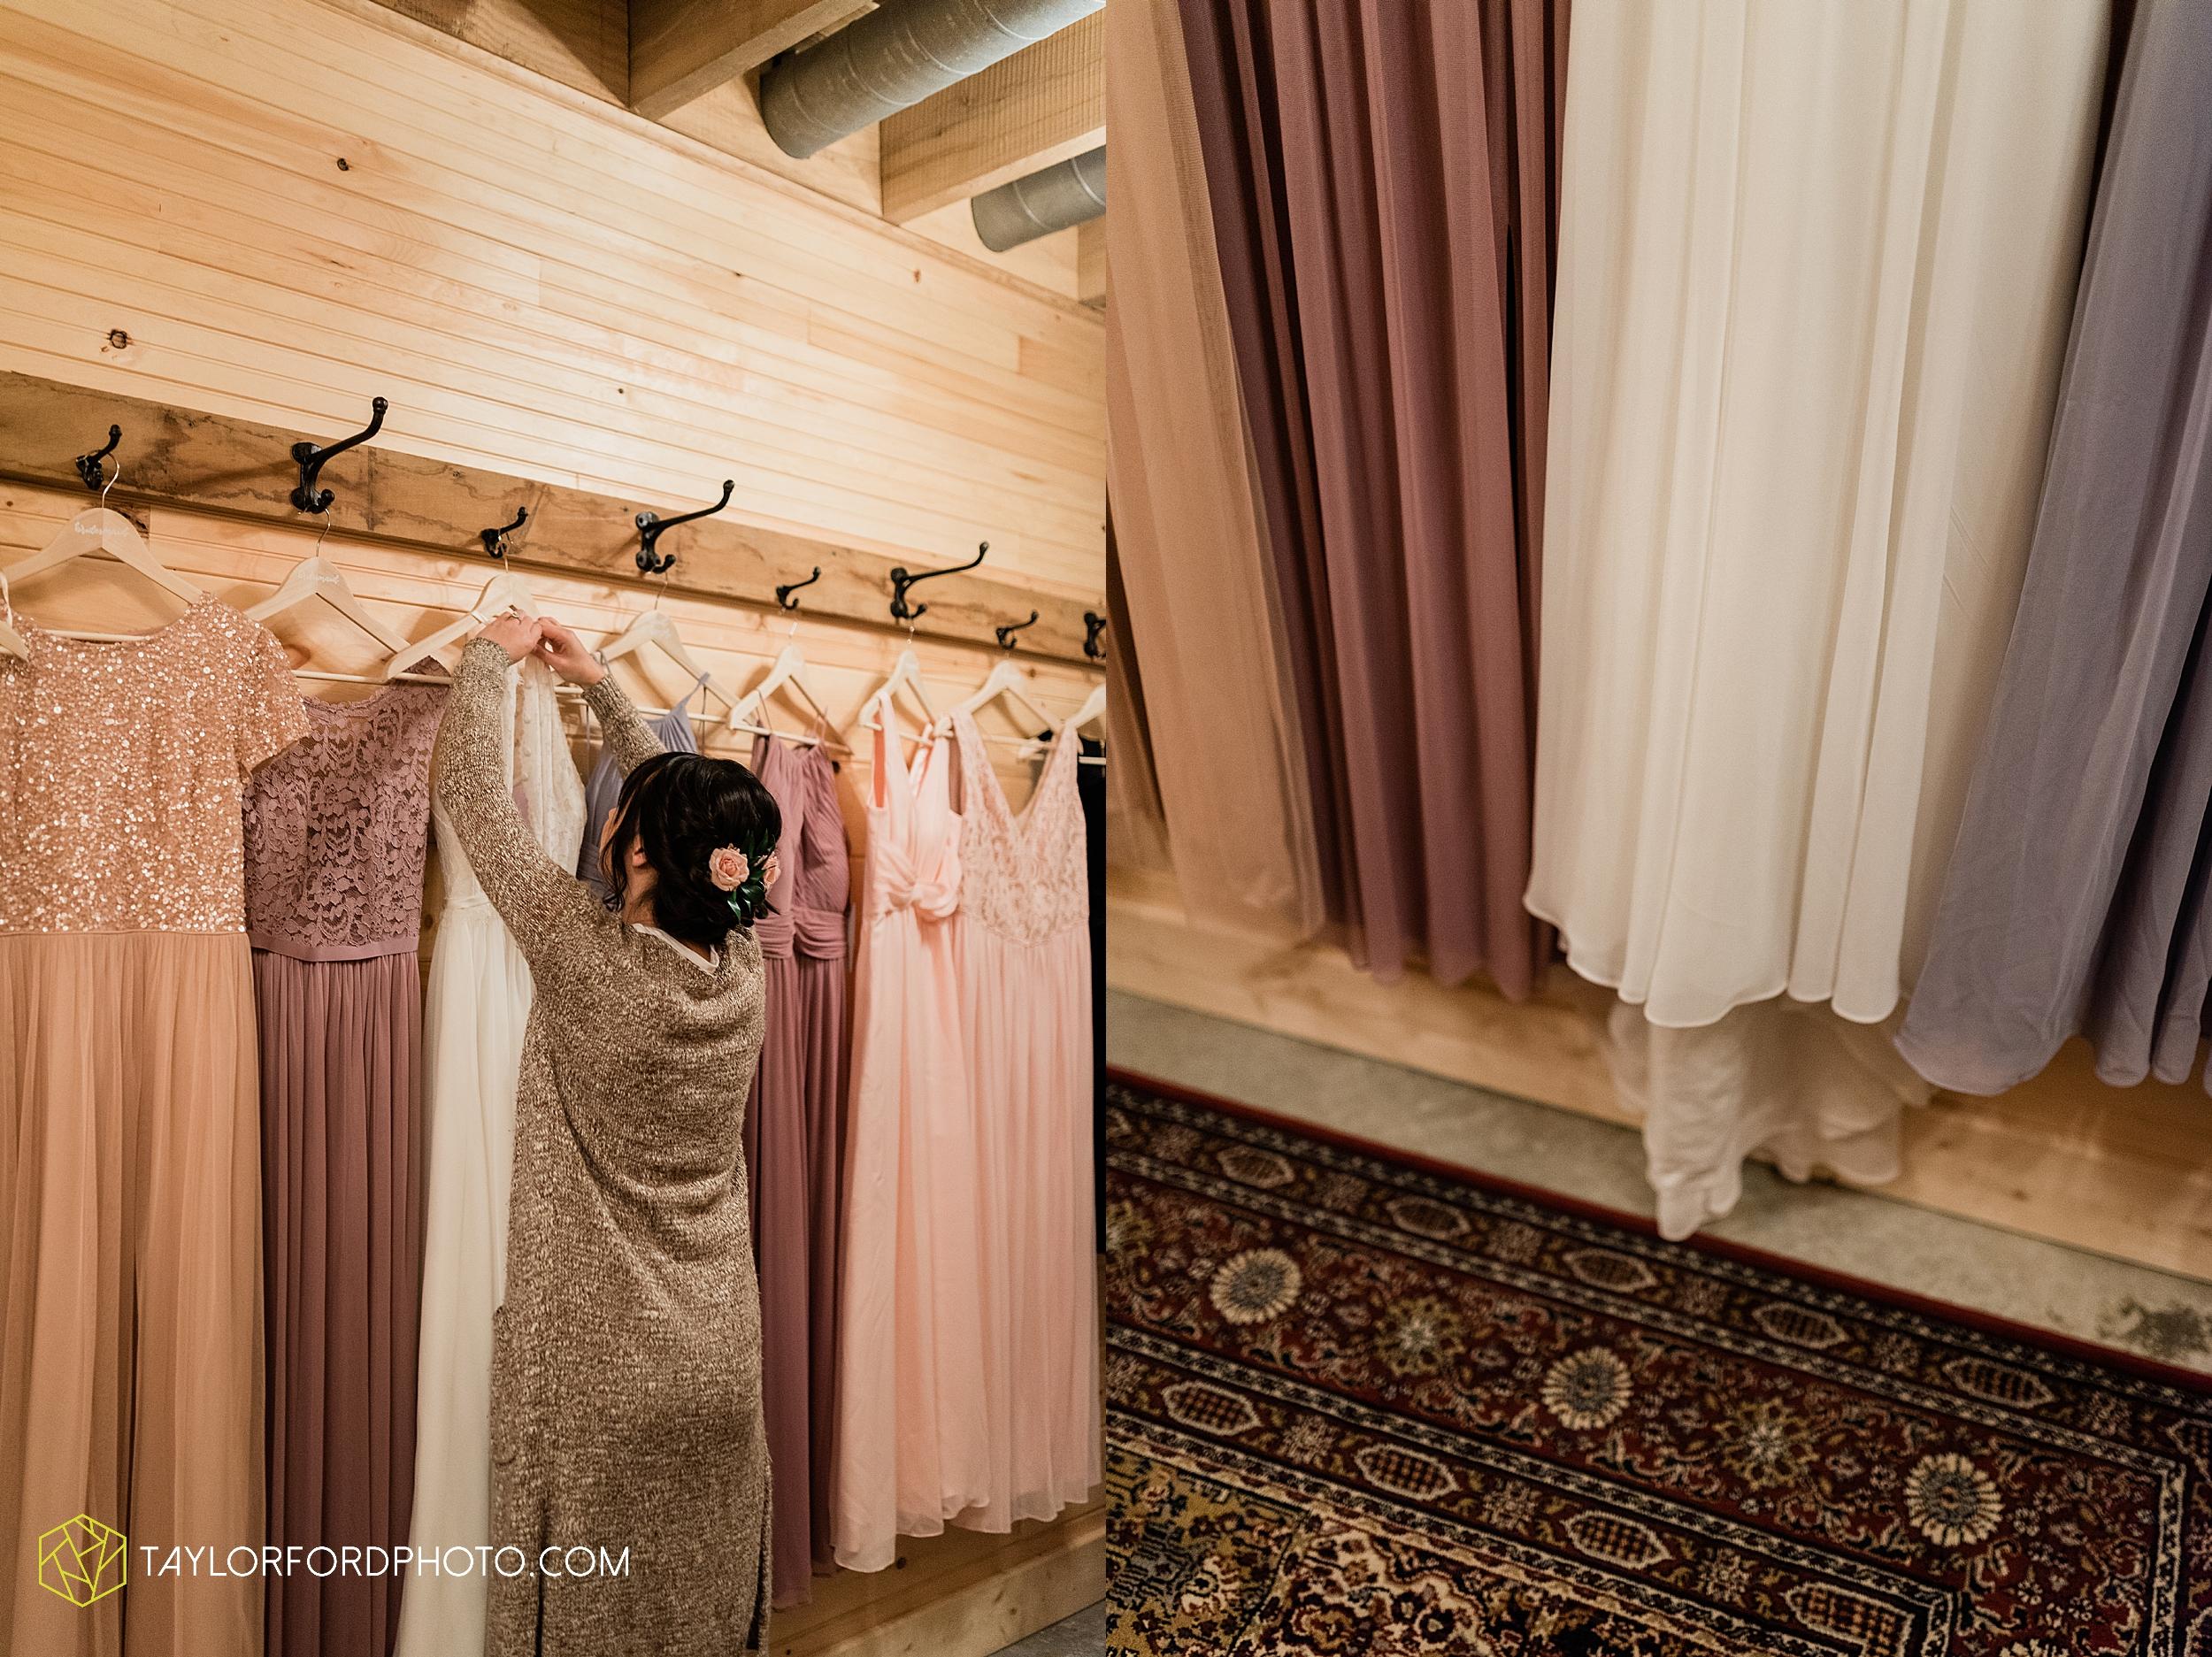 marissa-nicole-nick-daeger-orrmont-estate-farm-wedding-piqua-dayton-troy-ohio-fall-photographer-taylor-ford-photography_1499.jpg